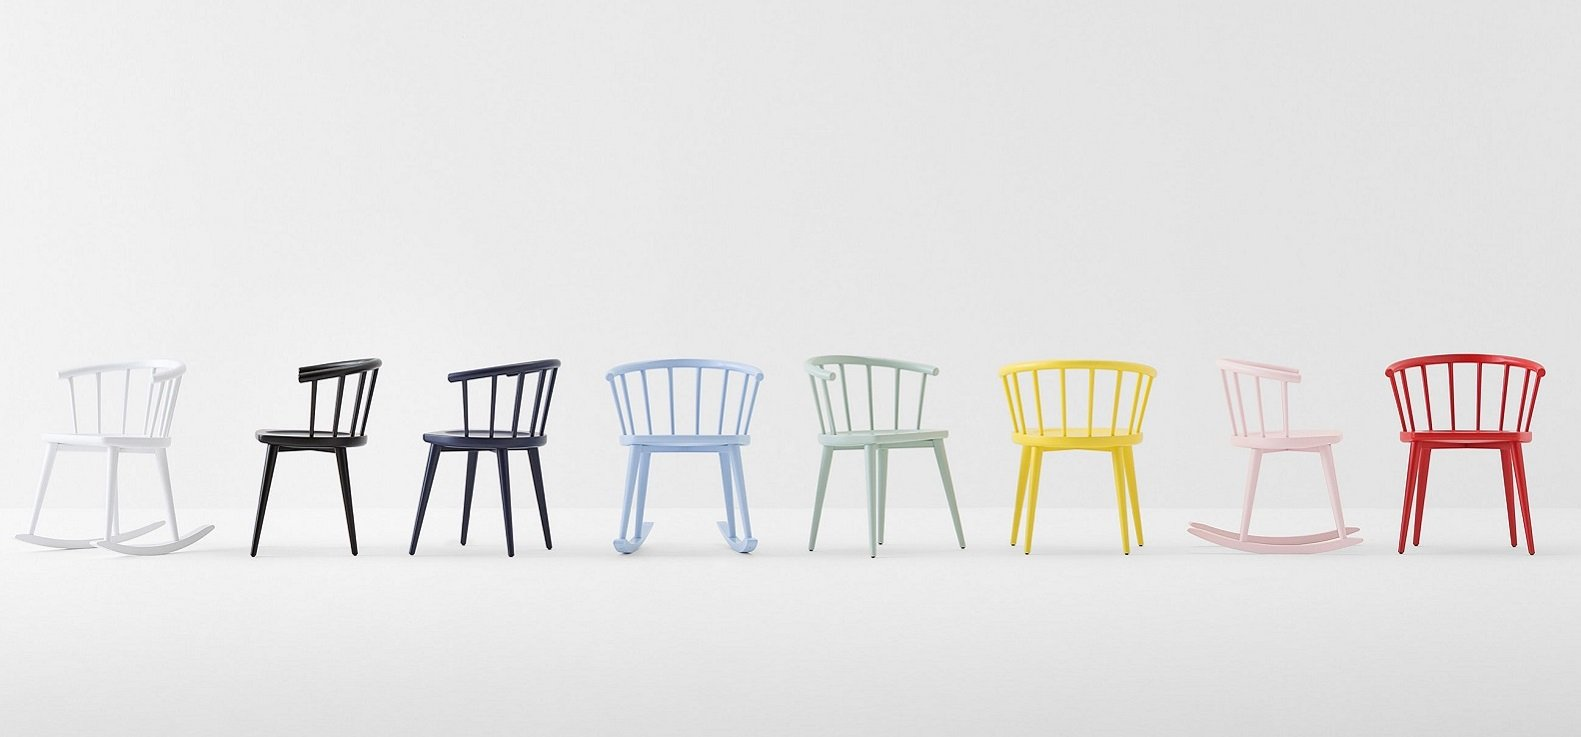 W Chair from Billiani